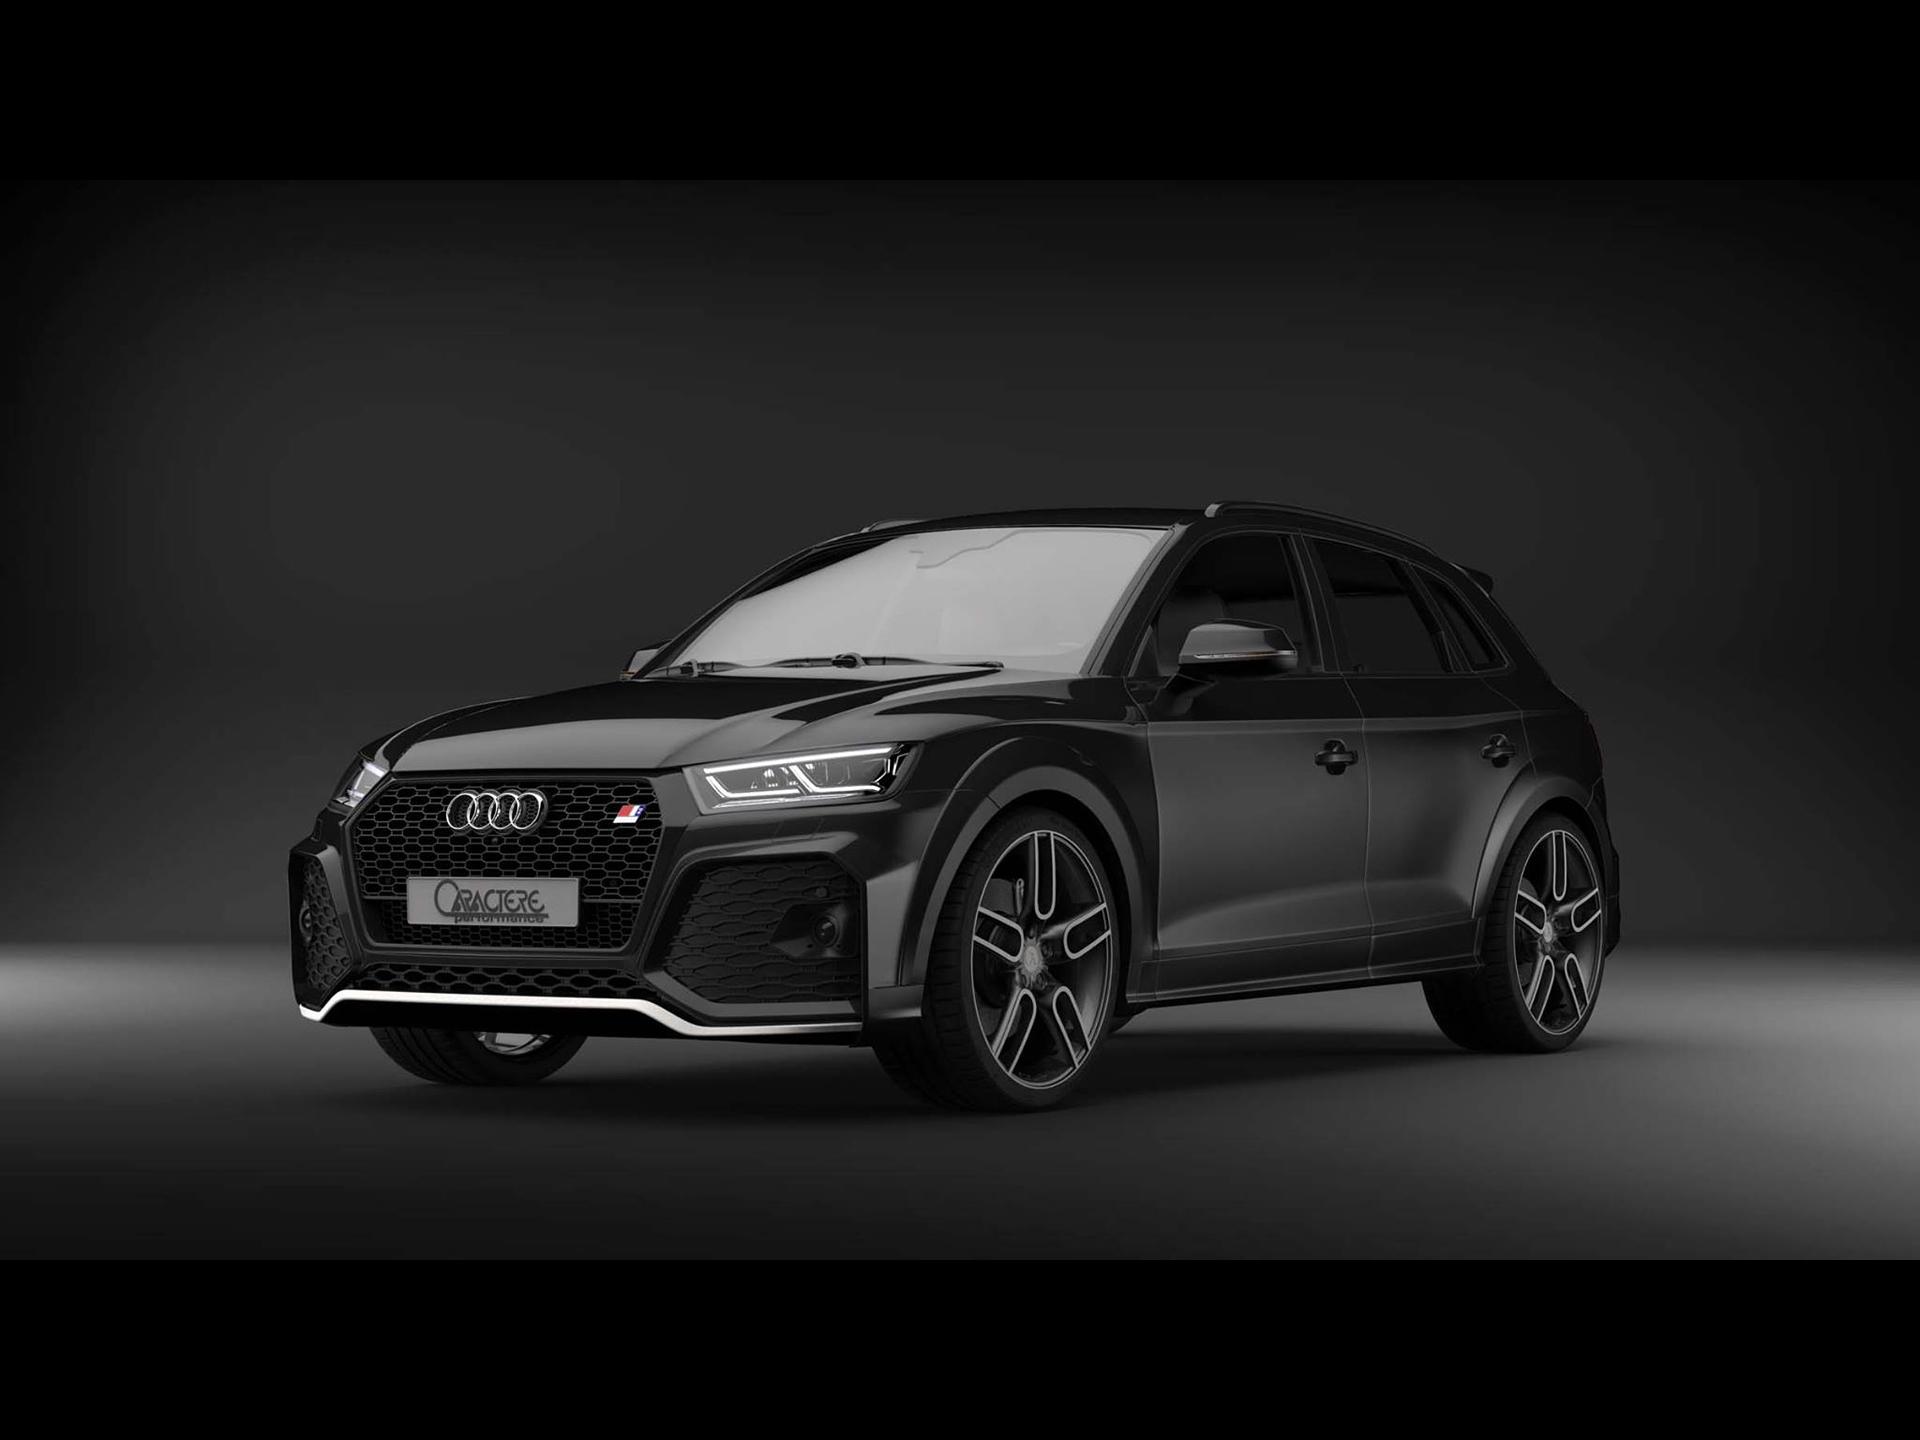 Caractere Audi Q5 2019 アウディに嵌まる 壁紙画像ブログ